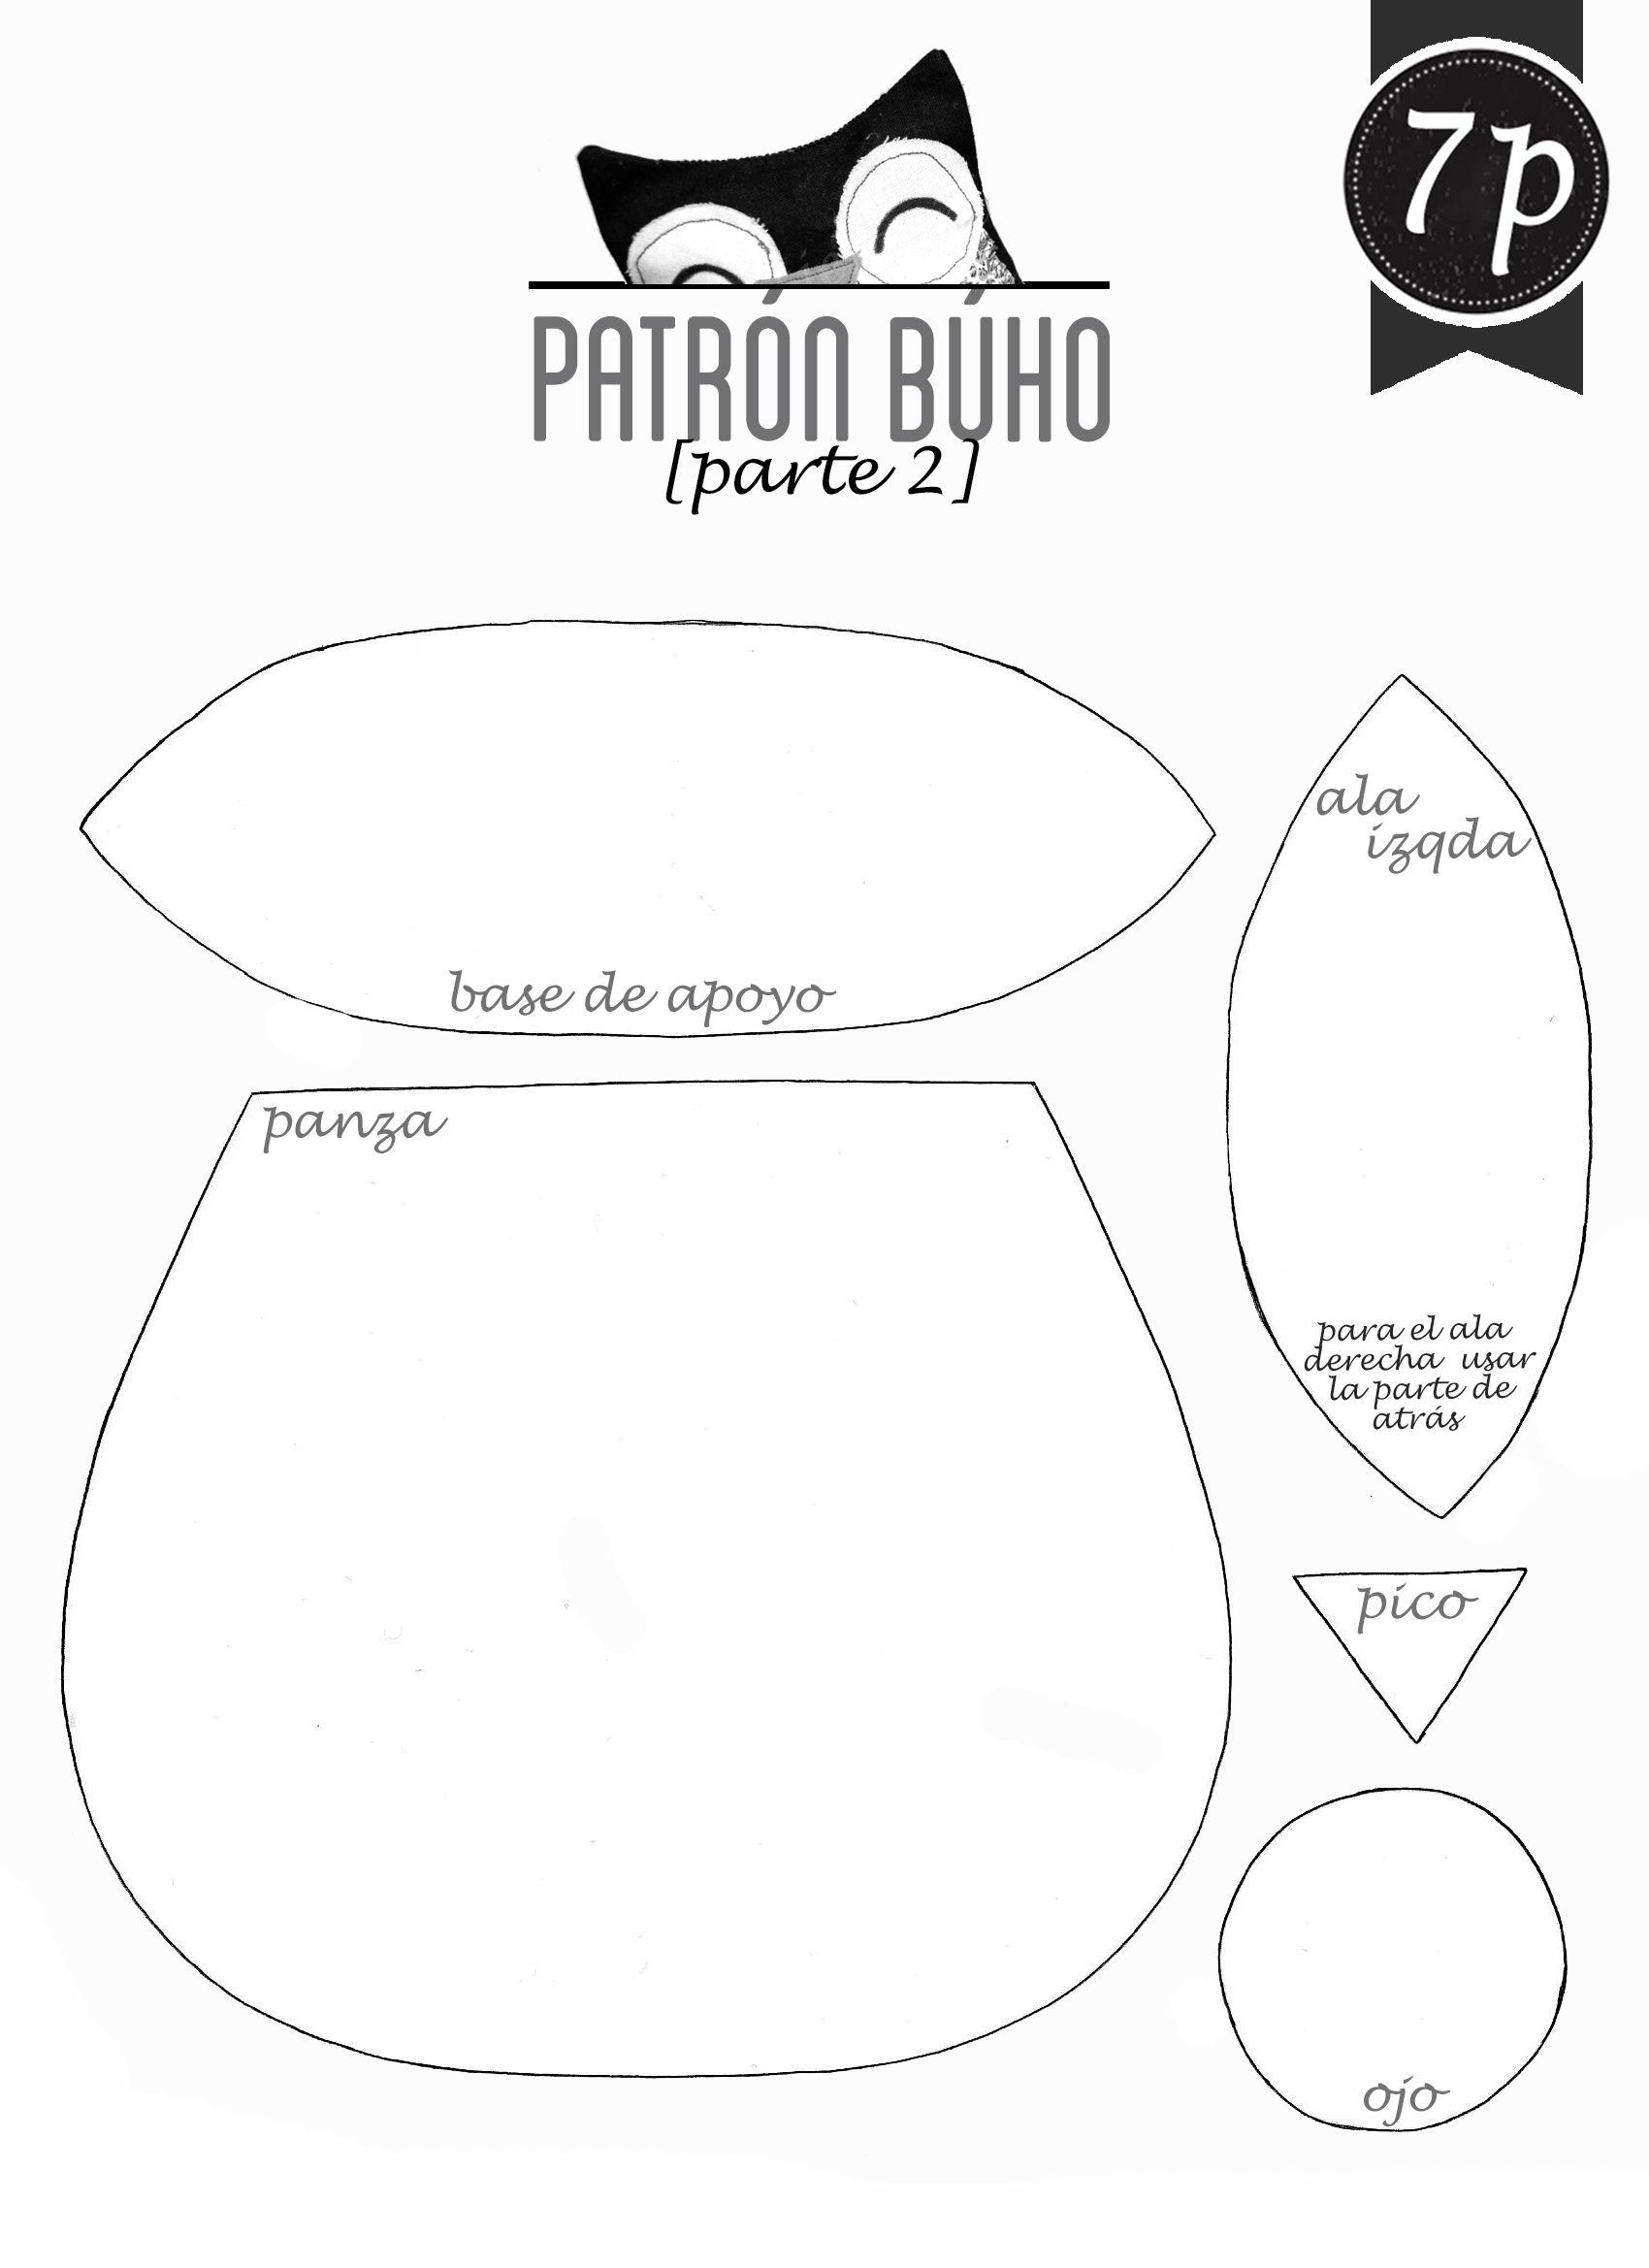 patron+muñeco+de+tela+patron+buho+de+tela+ | Costura/tela | Pinterest